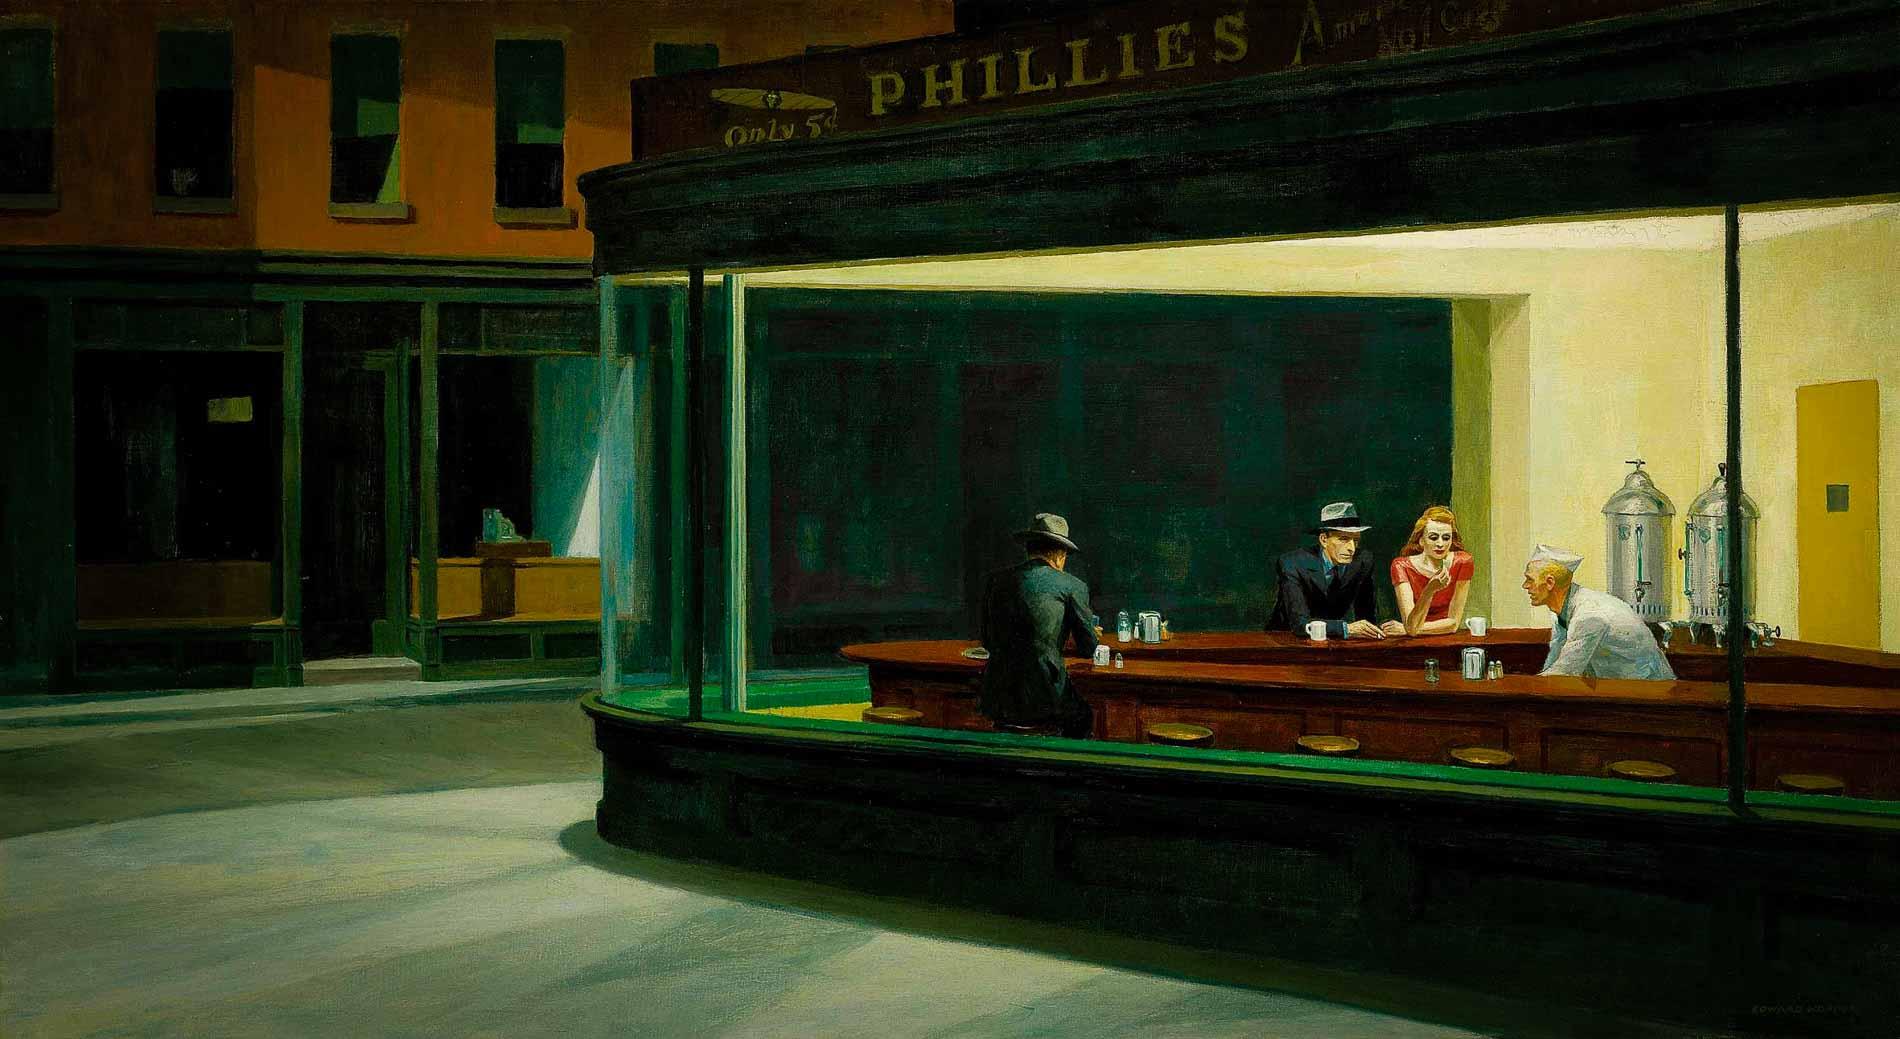 Nighthawks Edward Hopper Figurative Painting in the twentieth century